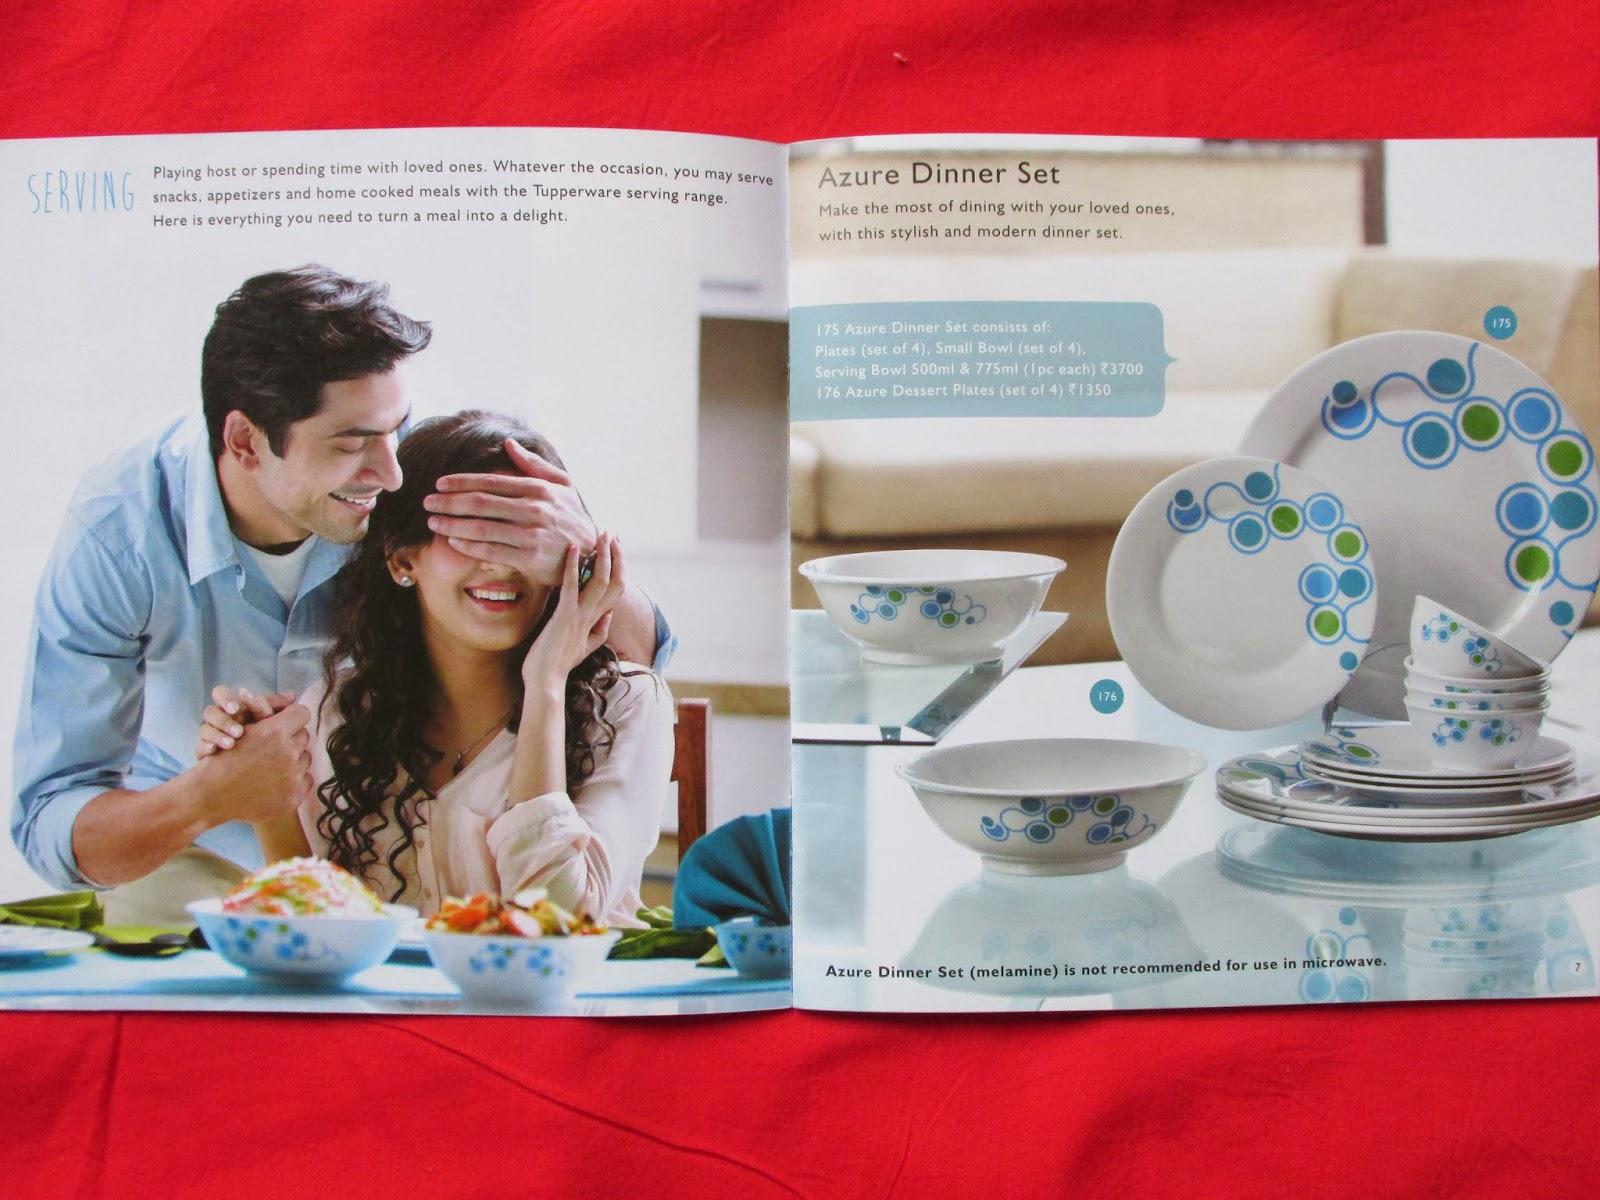 Buy Tupperware Products Catalogue January 2014 Eleganzia Bowl 600ml 4 Set Azure Dinner